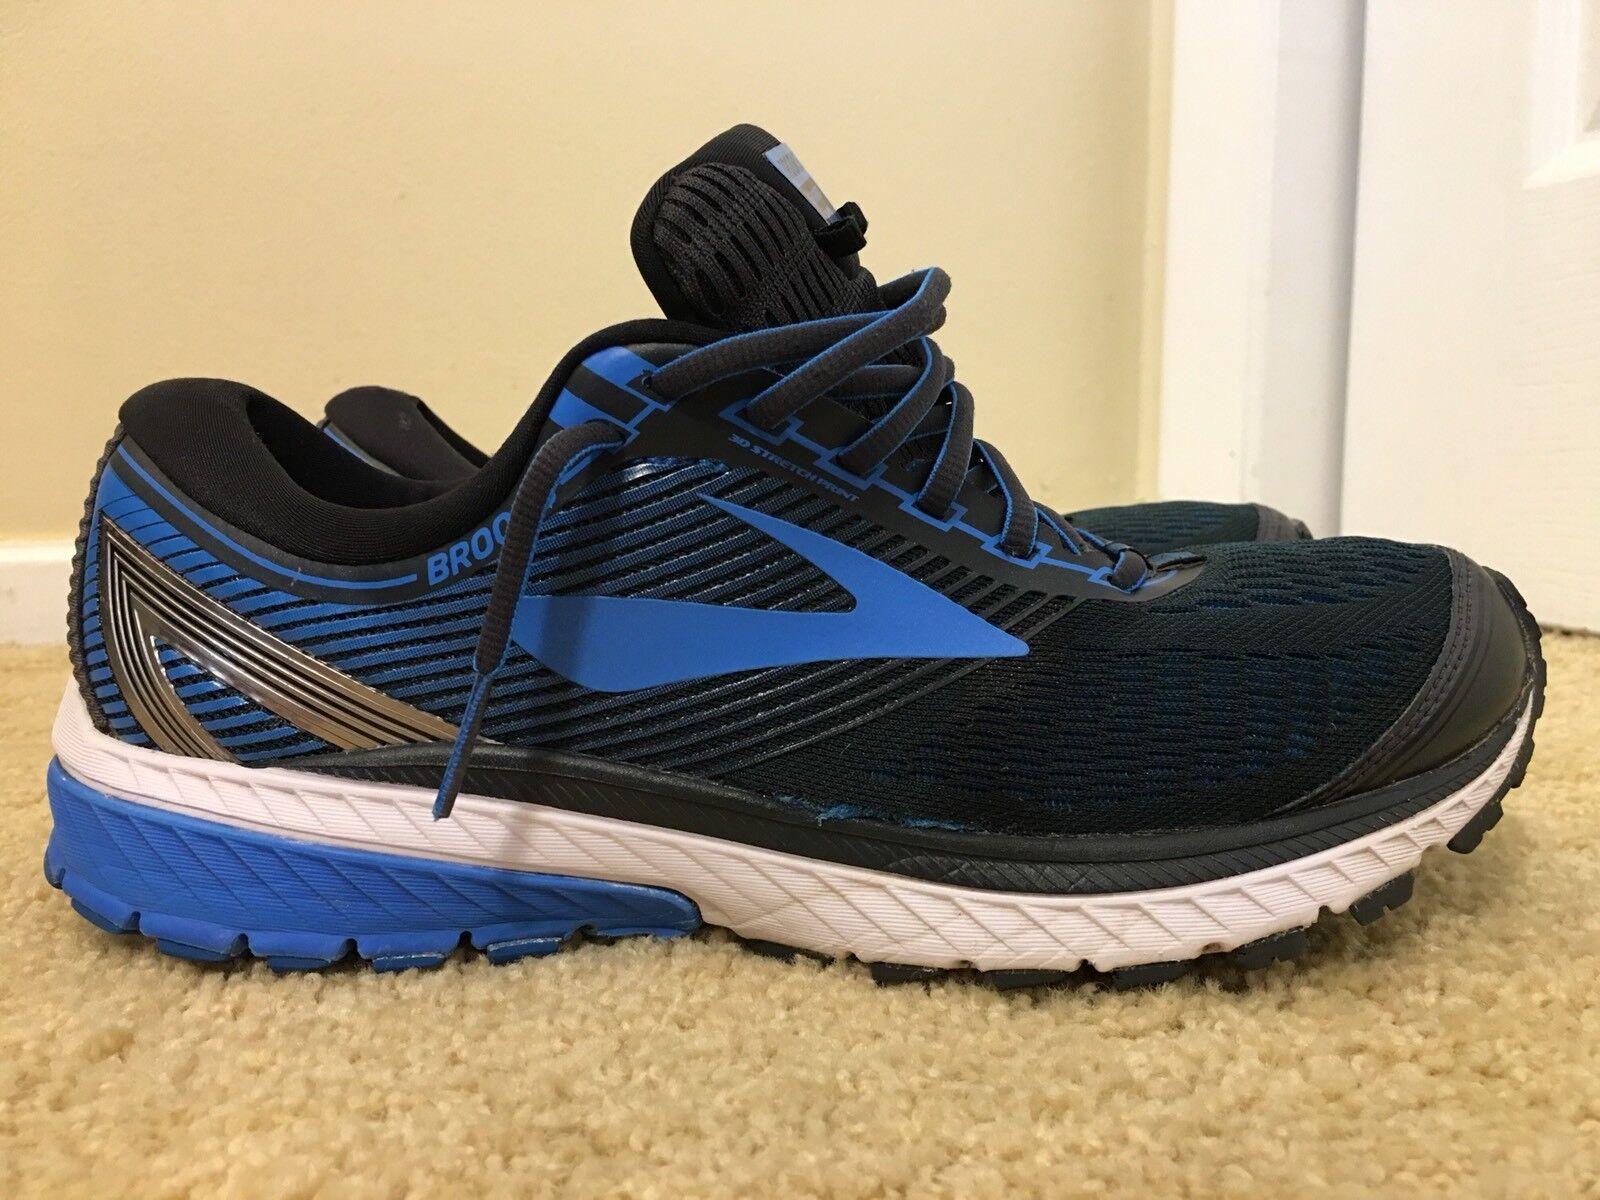 10 Hommes Running Chaussures 1102571d056 Ghost Brooks 7qIx5w8x